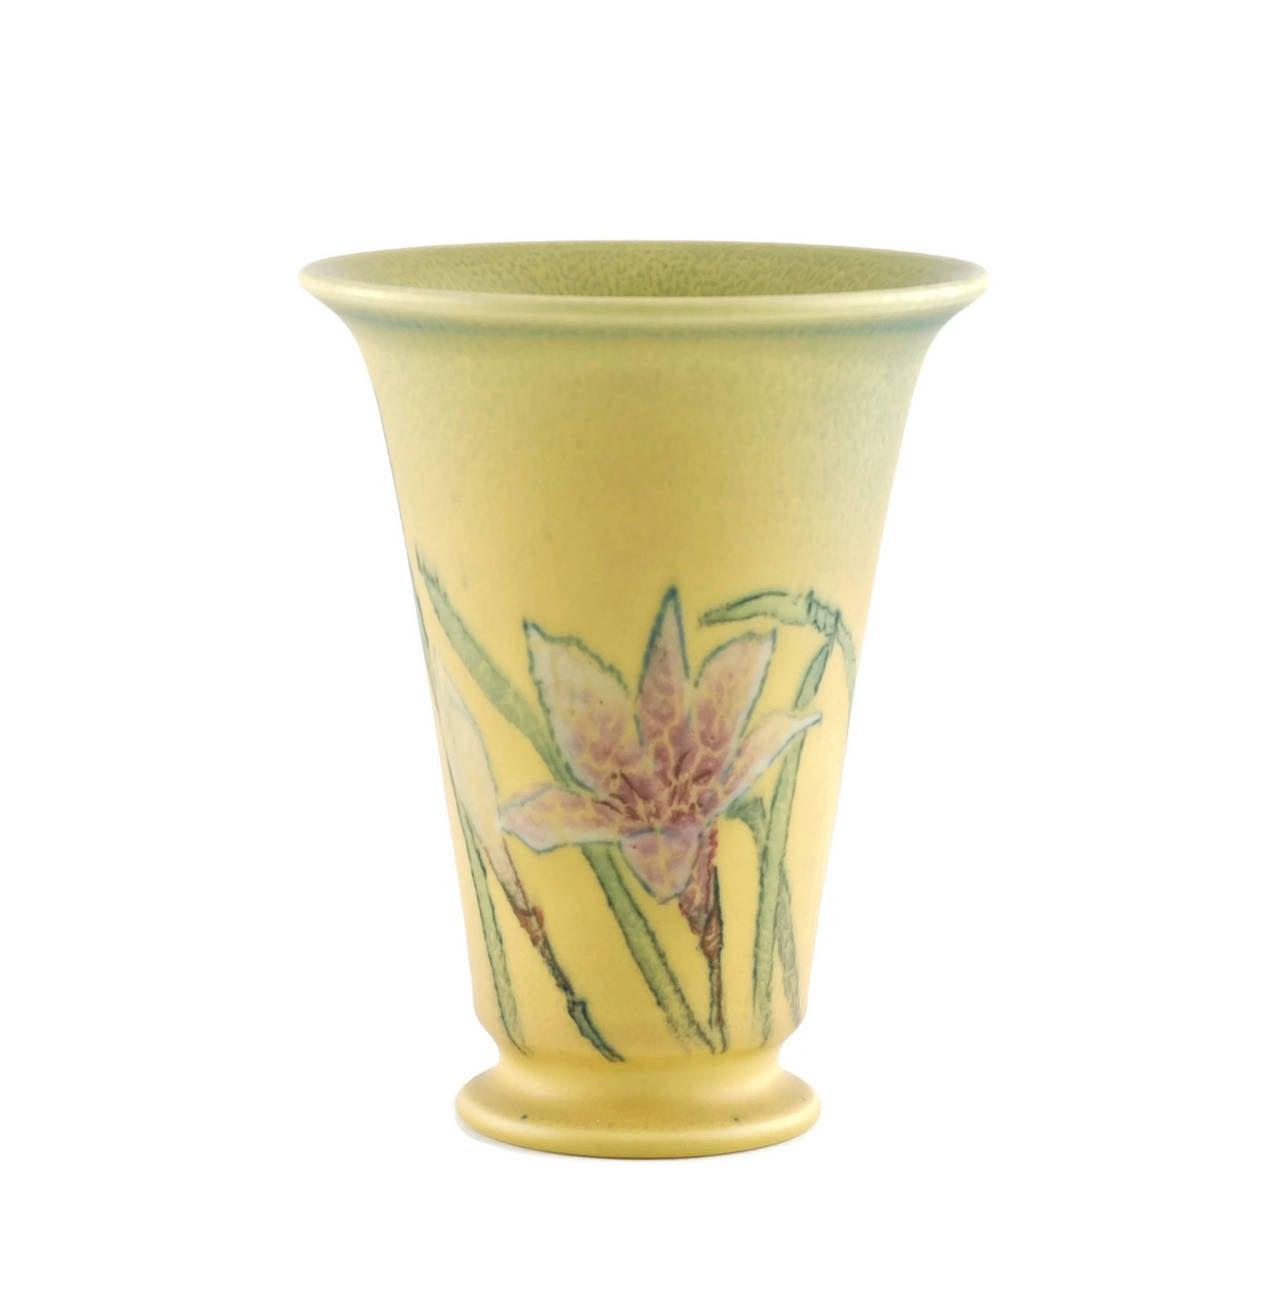 Art Nouveau Kataro Shirayamadani Signed Rookwood Pottery Vase with Floral Motif For Sale